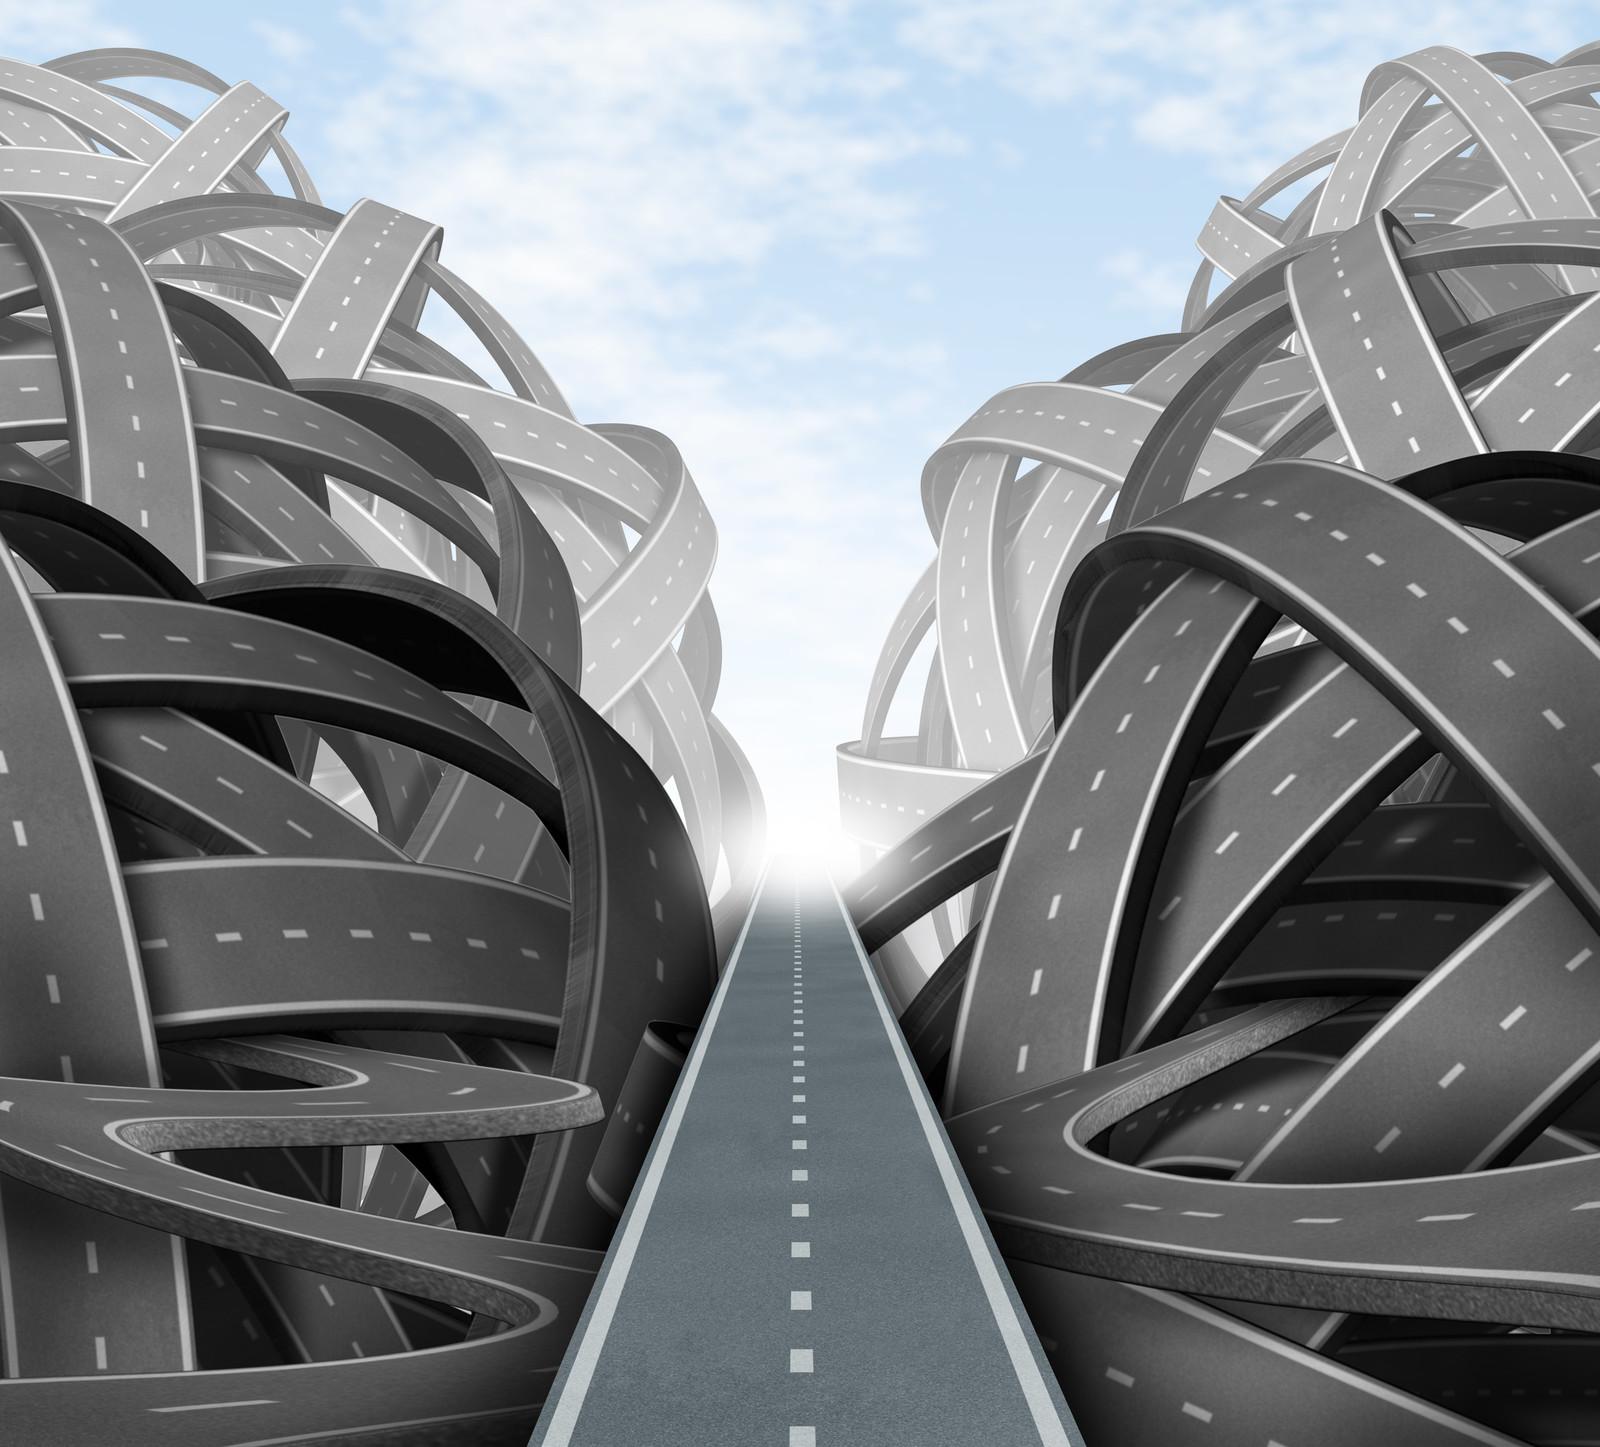 Decreasing the Chaos After an Organizational Restructure